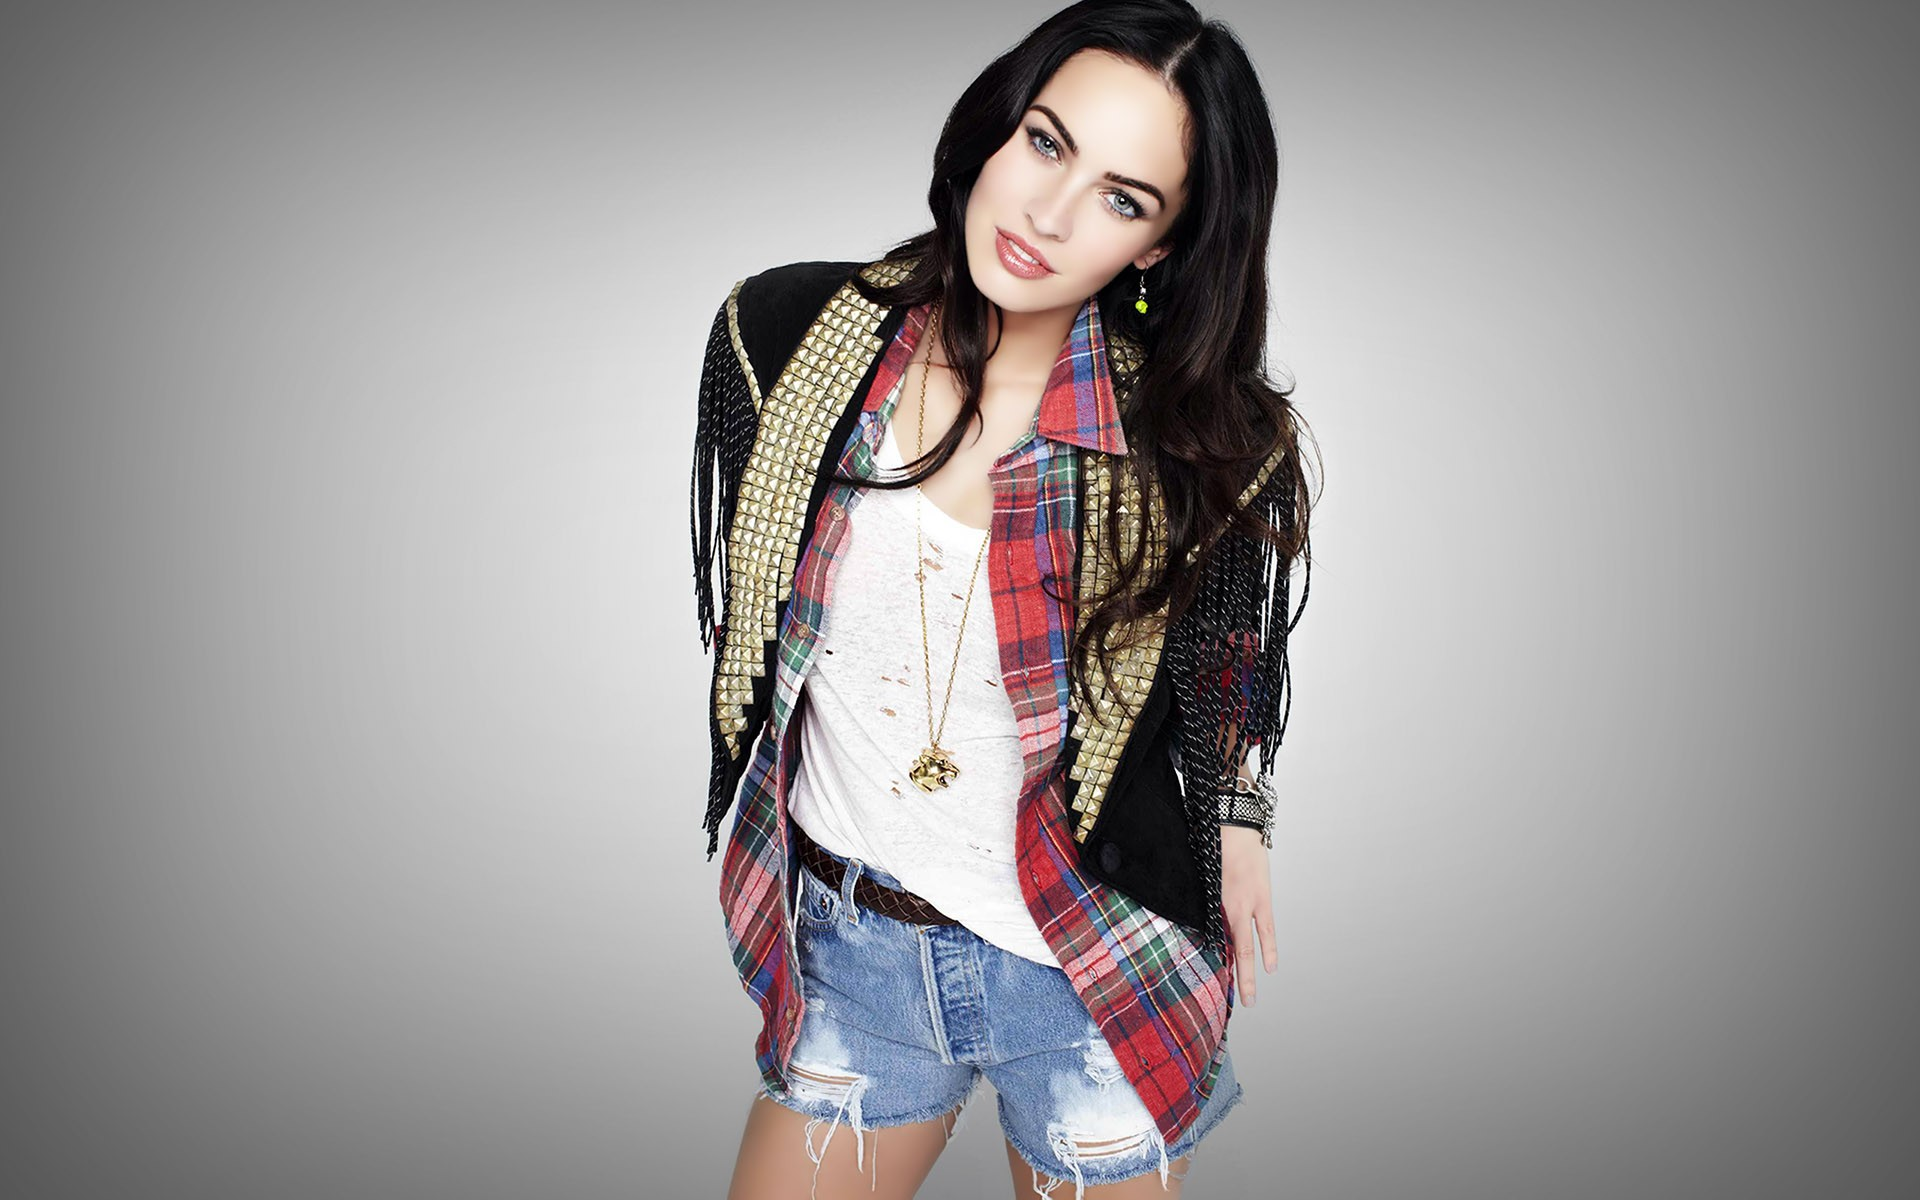 Megan Fox 2013 - 1920x1200